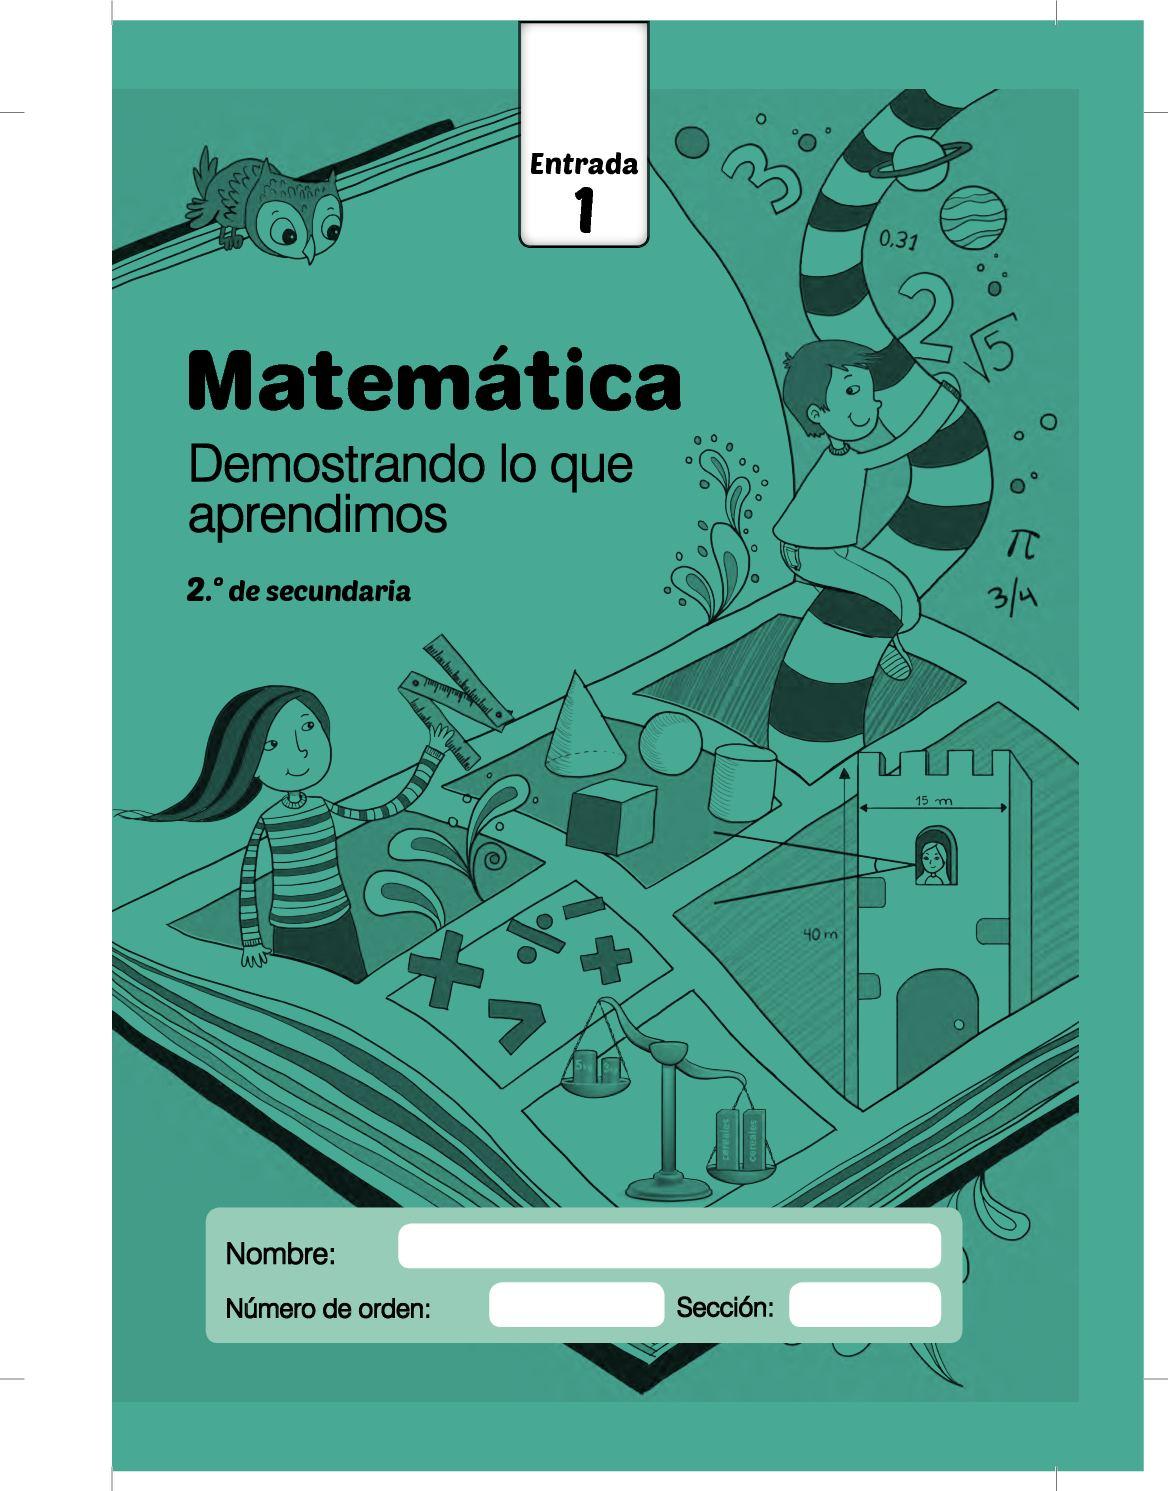 Cuadernillos Secundaria Matematica Entrada Cuadernillo Entrada1 Matematica 2do Grado